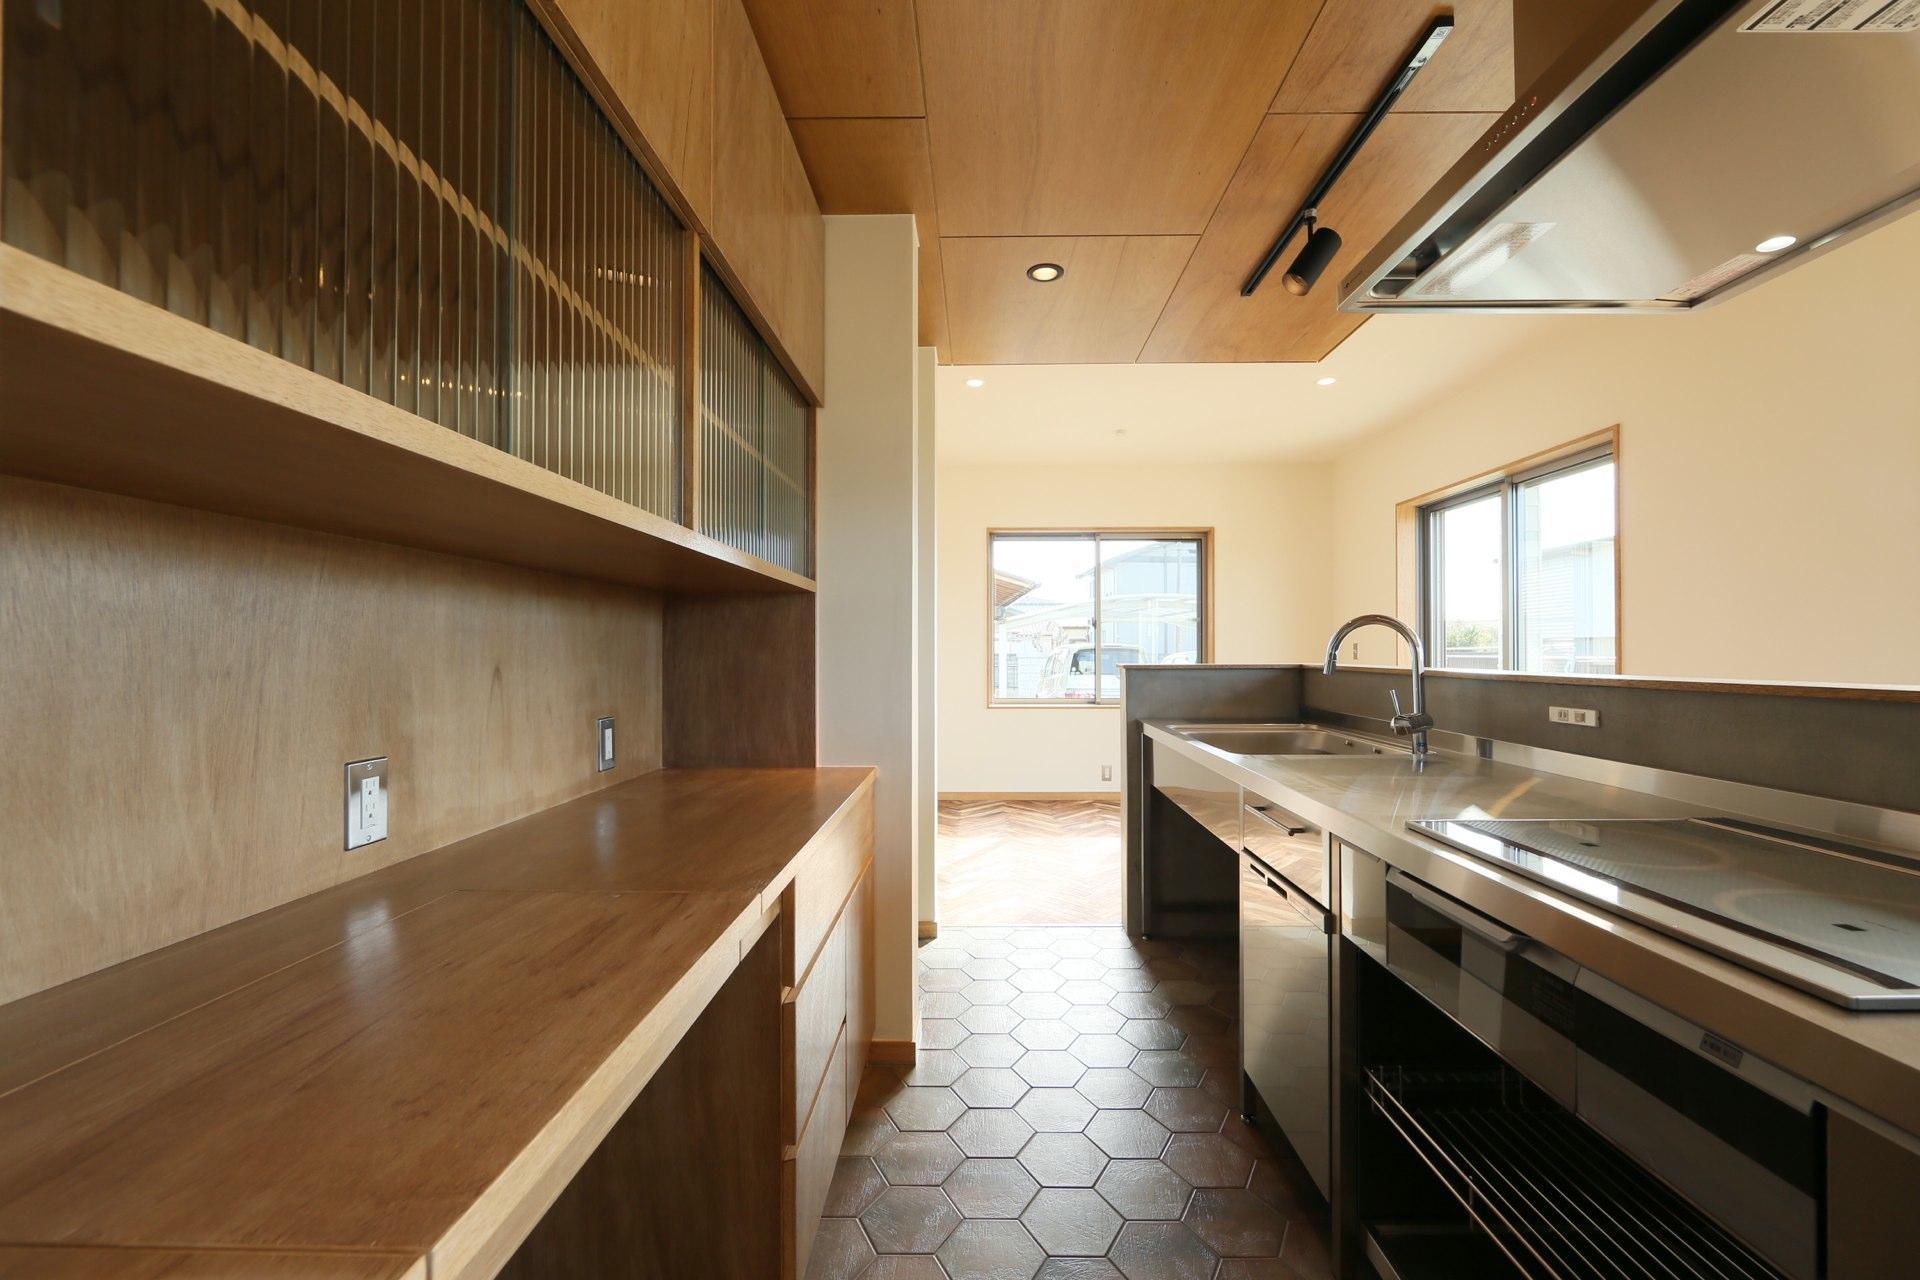 Y's residenceの写真 キッチン2